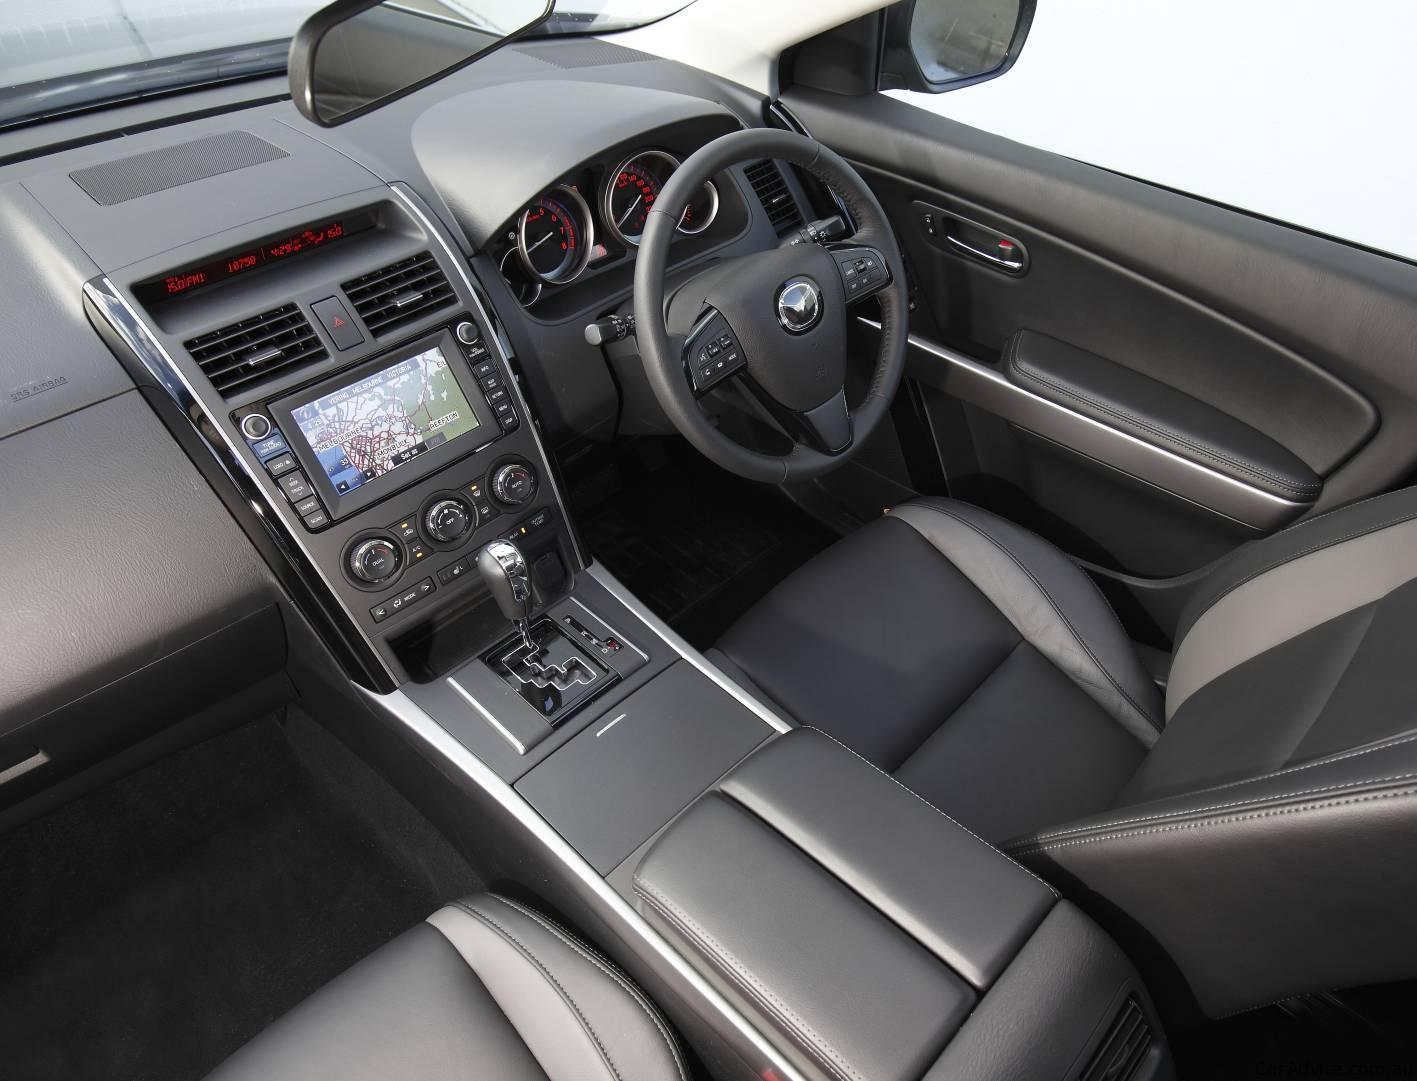 Mazda Cx 9 >> Mazda CX-9 Review & Road Test - photos   CarAdvice